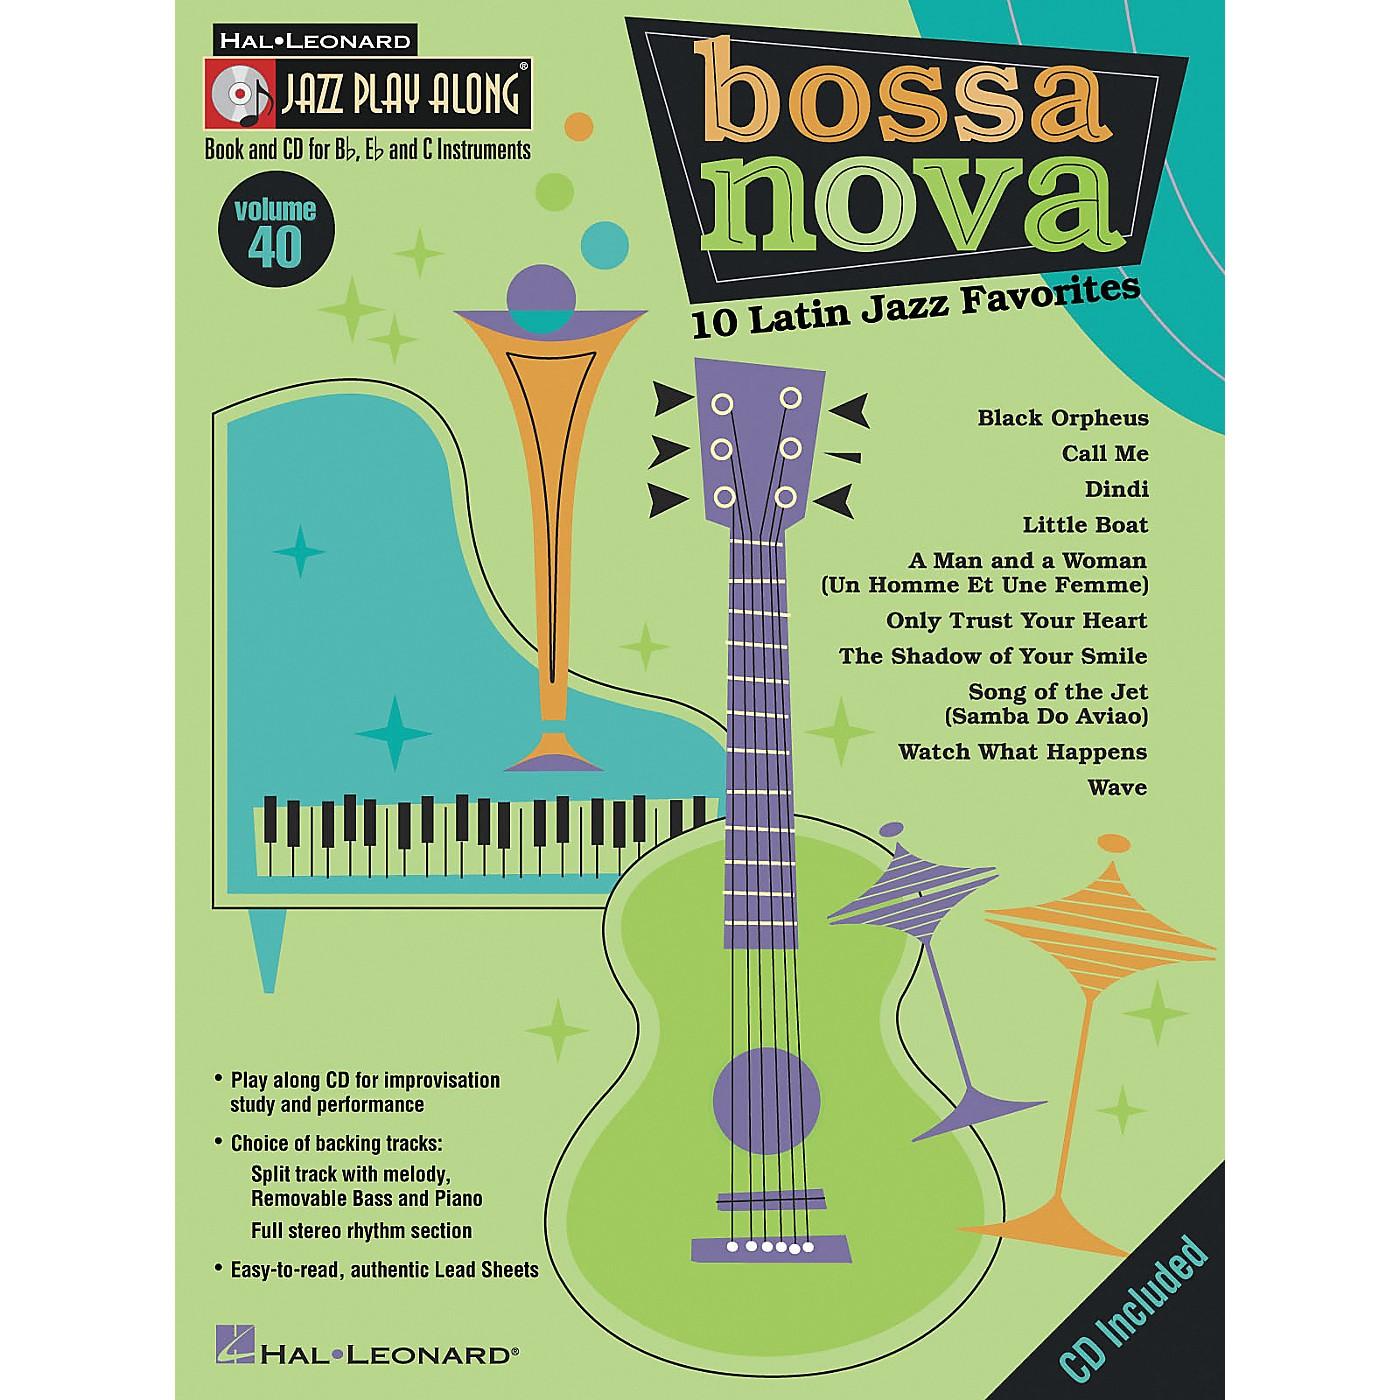 Hal Leonard Jazz Play Along Series, Volume 40: Bossa Nova - 10 Latin Jazz Favorites (Book/CD) thumbnail